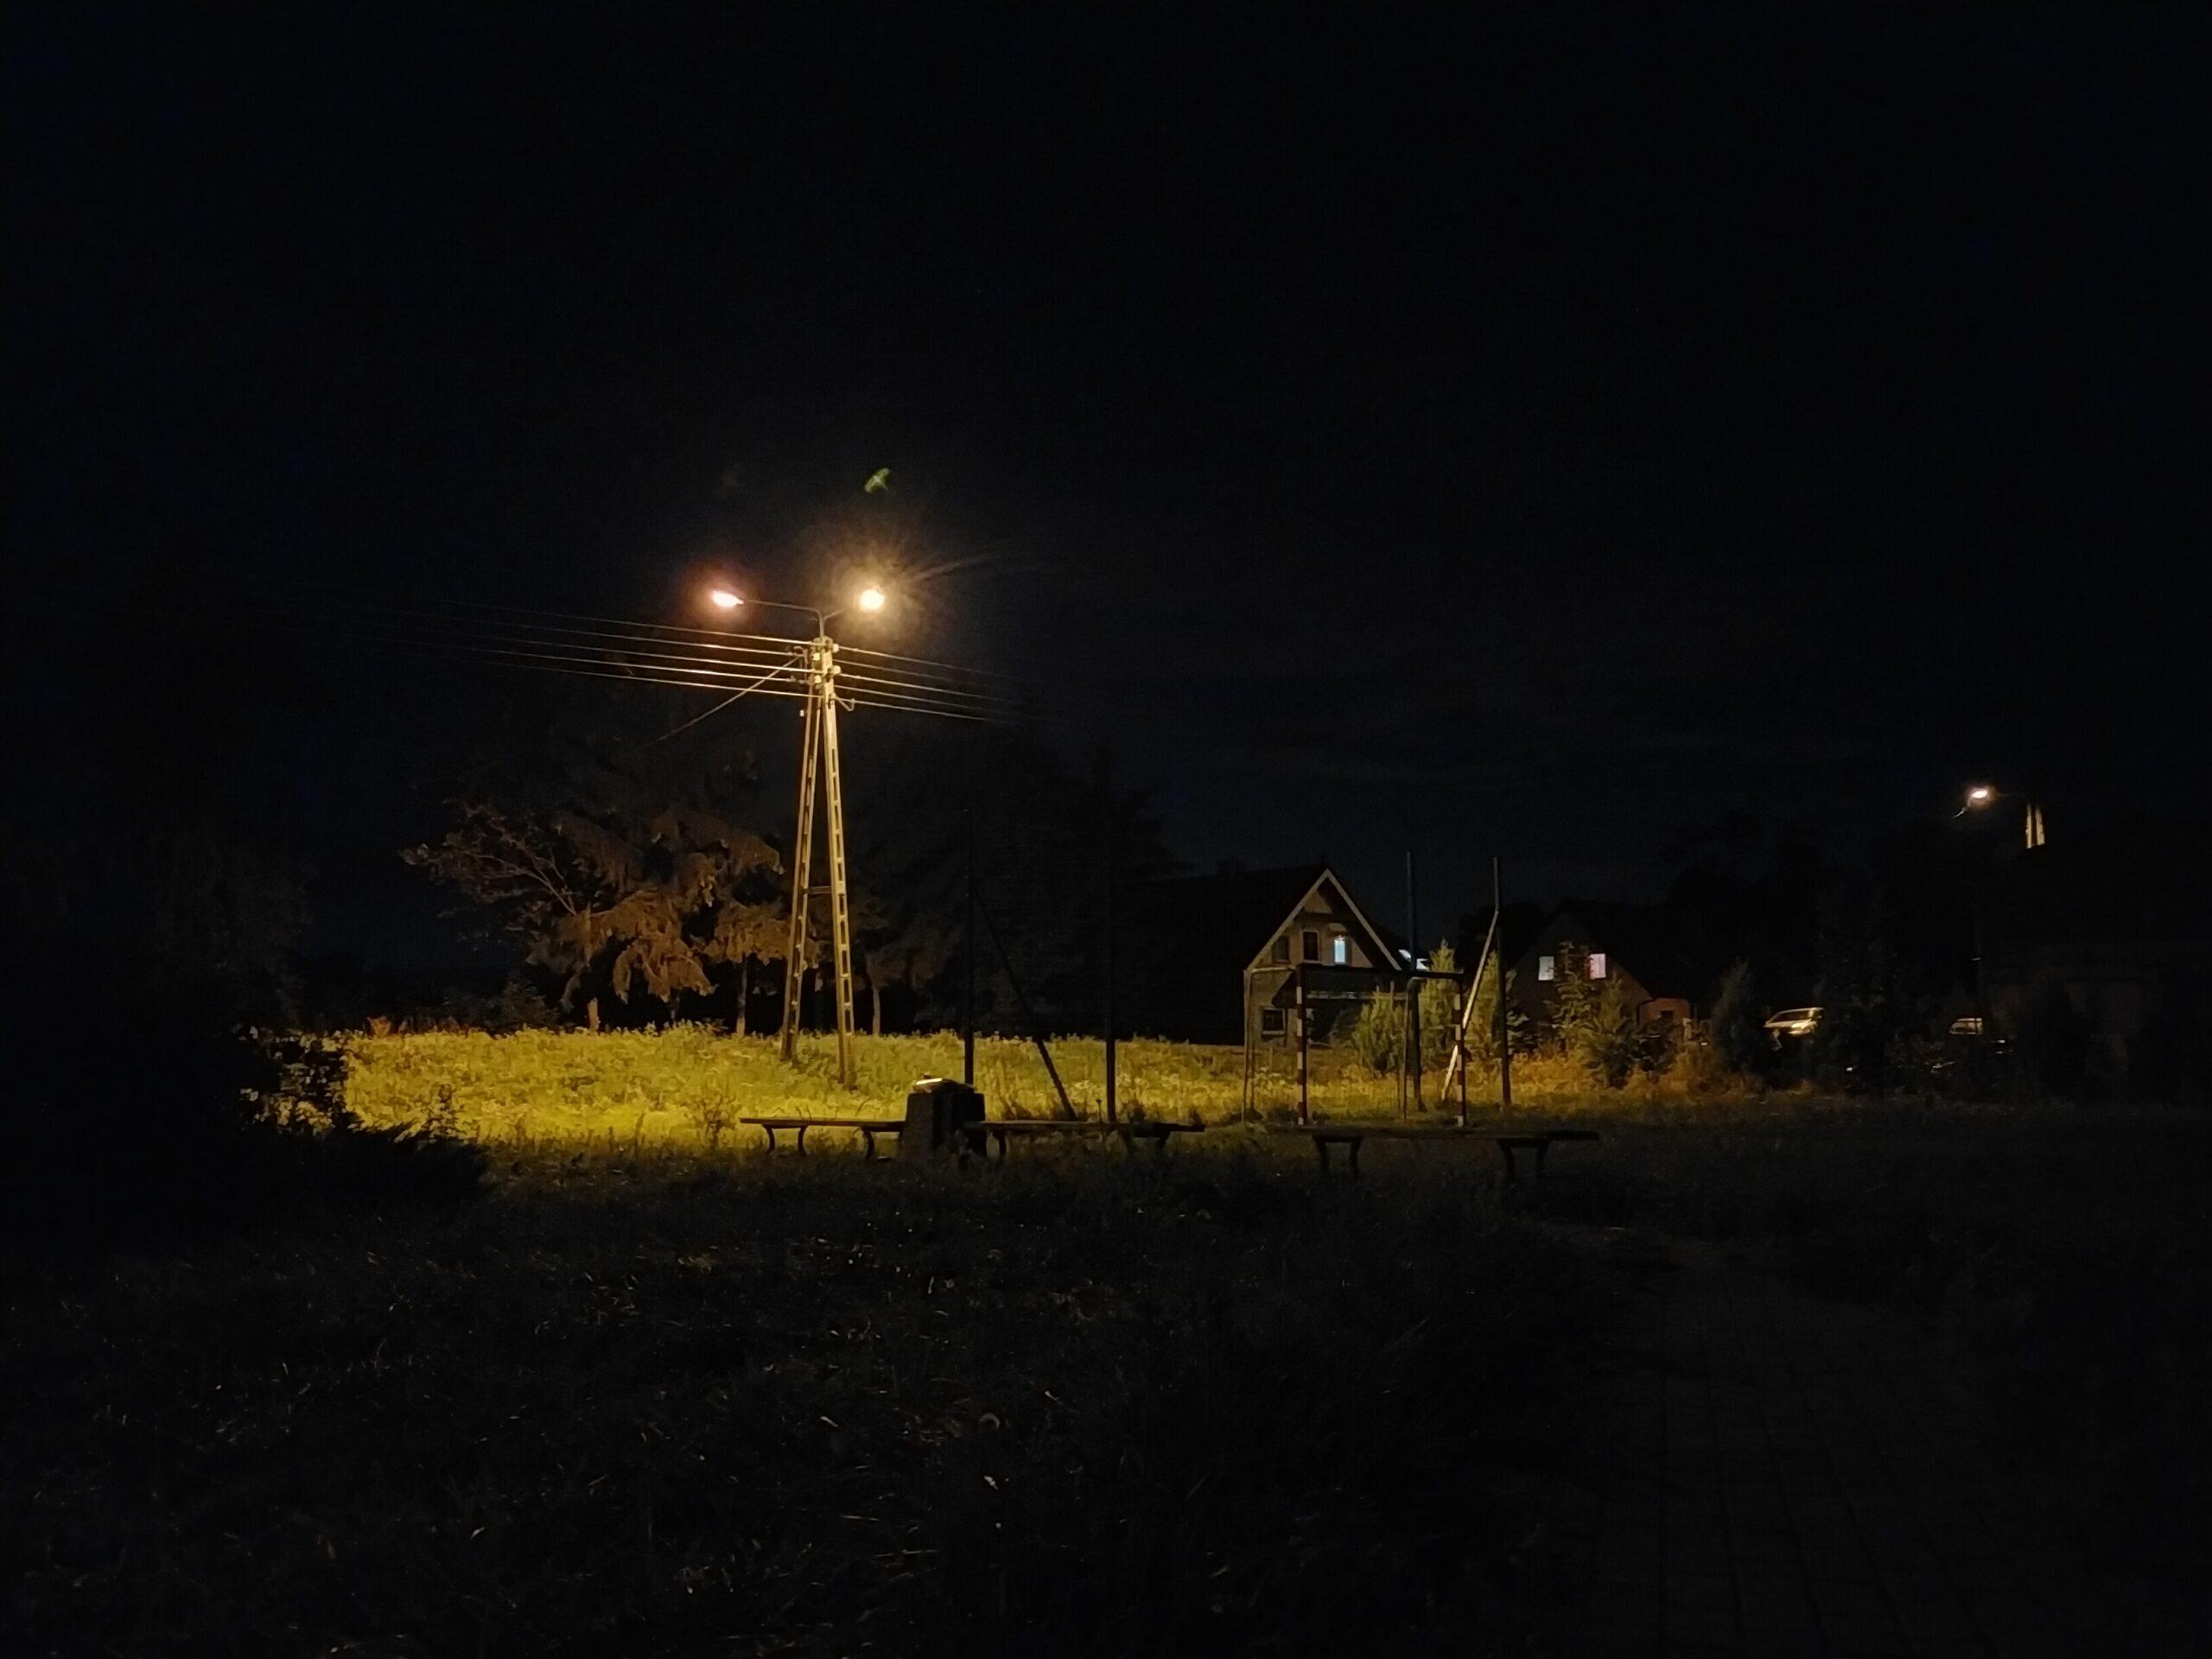 OPPO A72 - main111 - Night